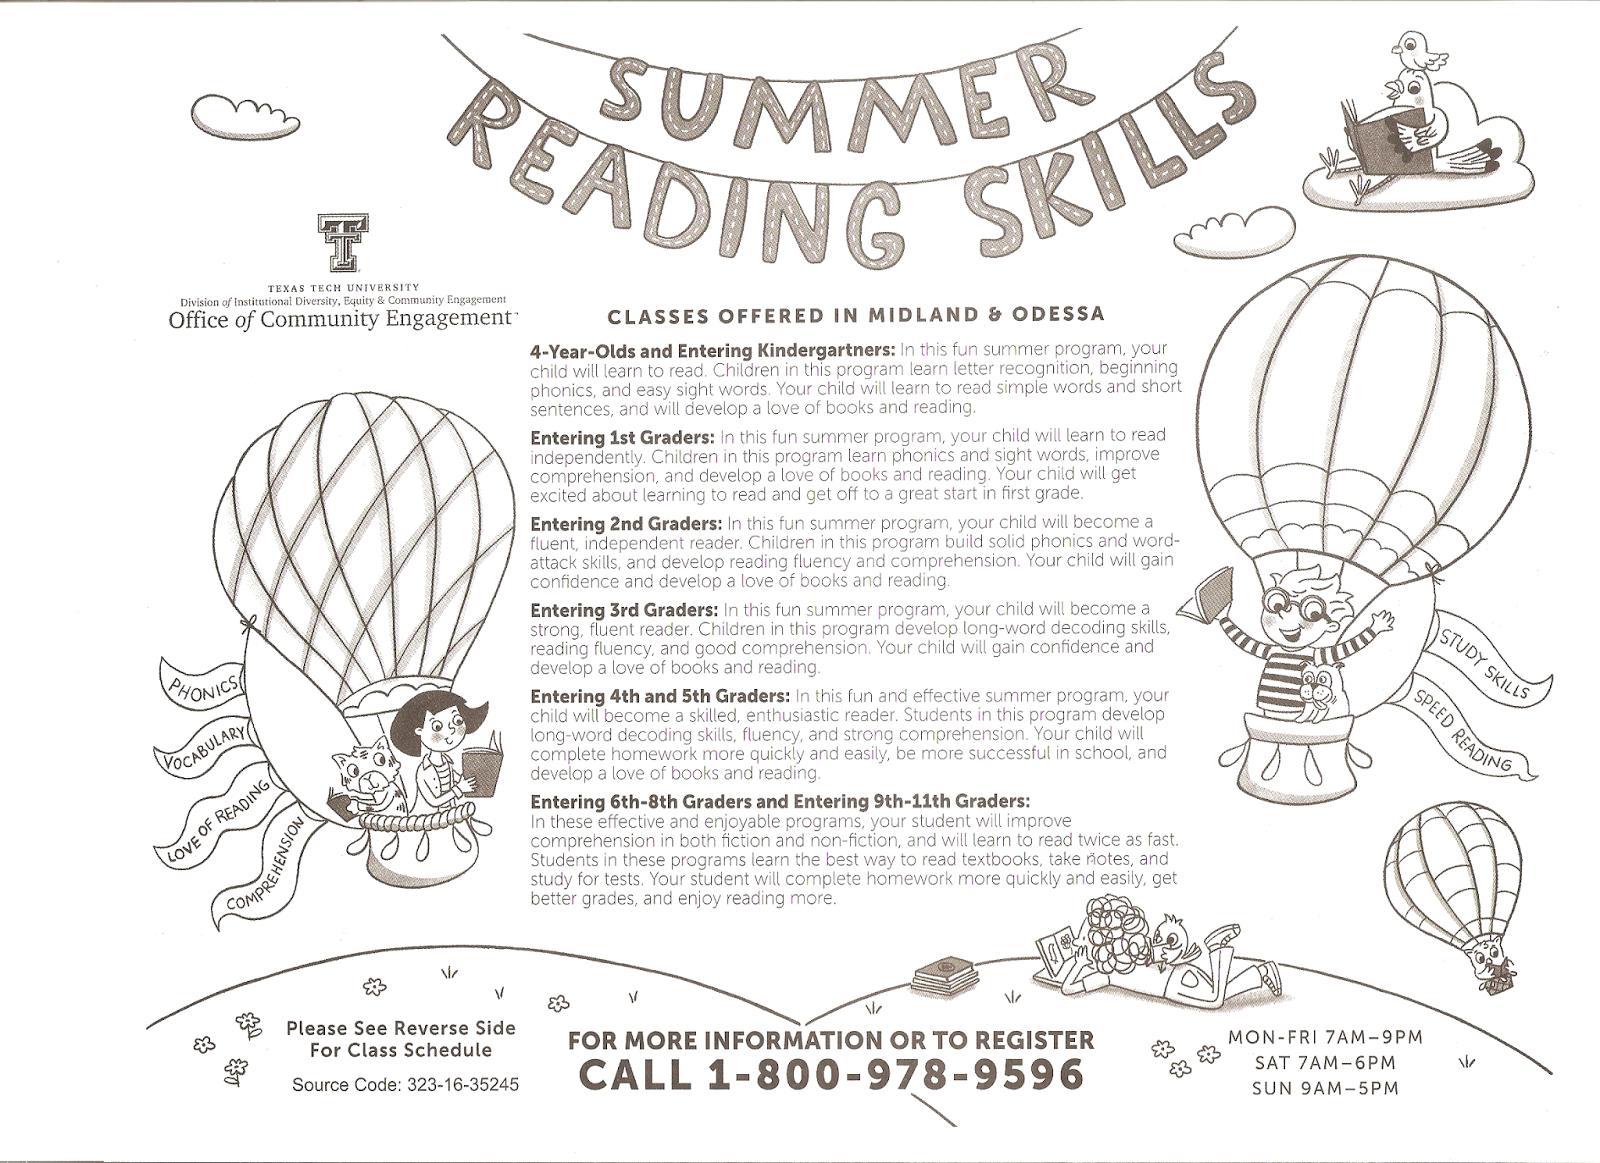 St. Ann's School 3A: Summer Reading